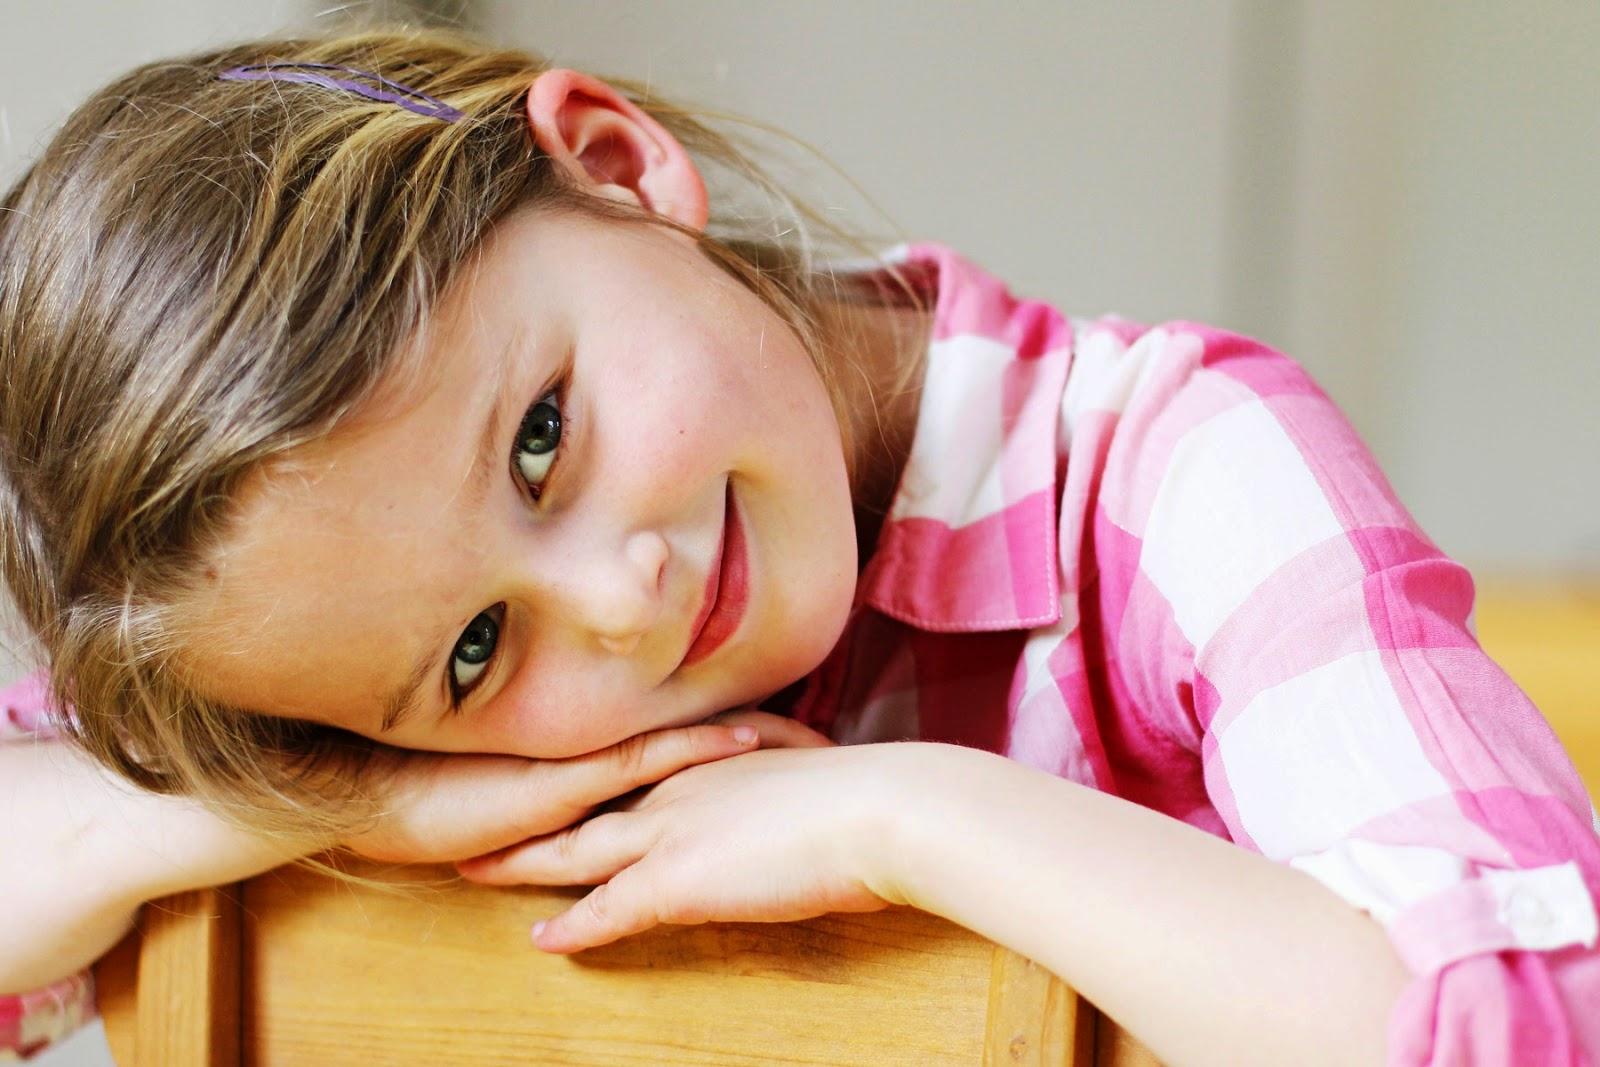 aa98a516f3b7 Jango Wallpapers  Most Beautiful Smiling Baby Girls HD Pics